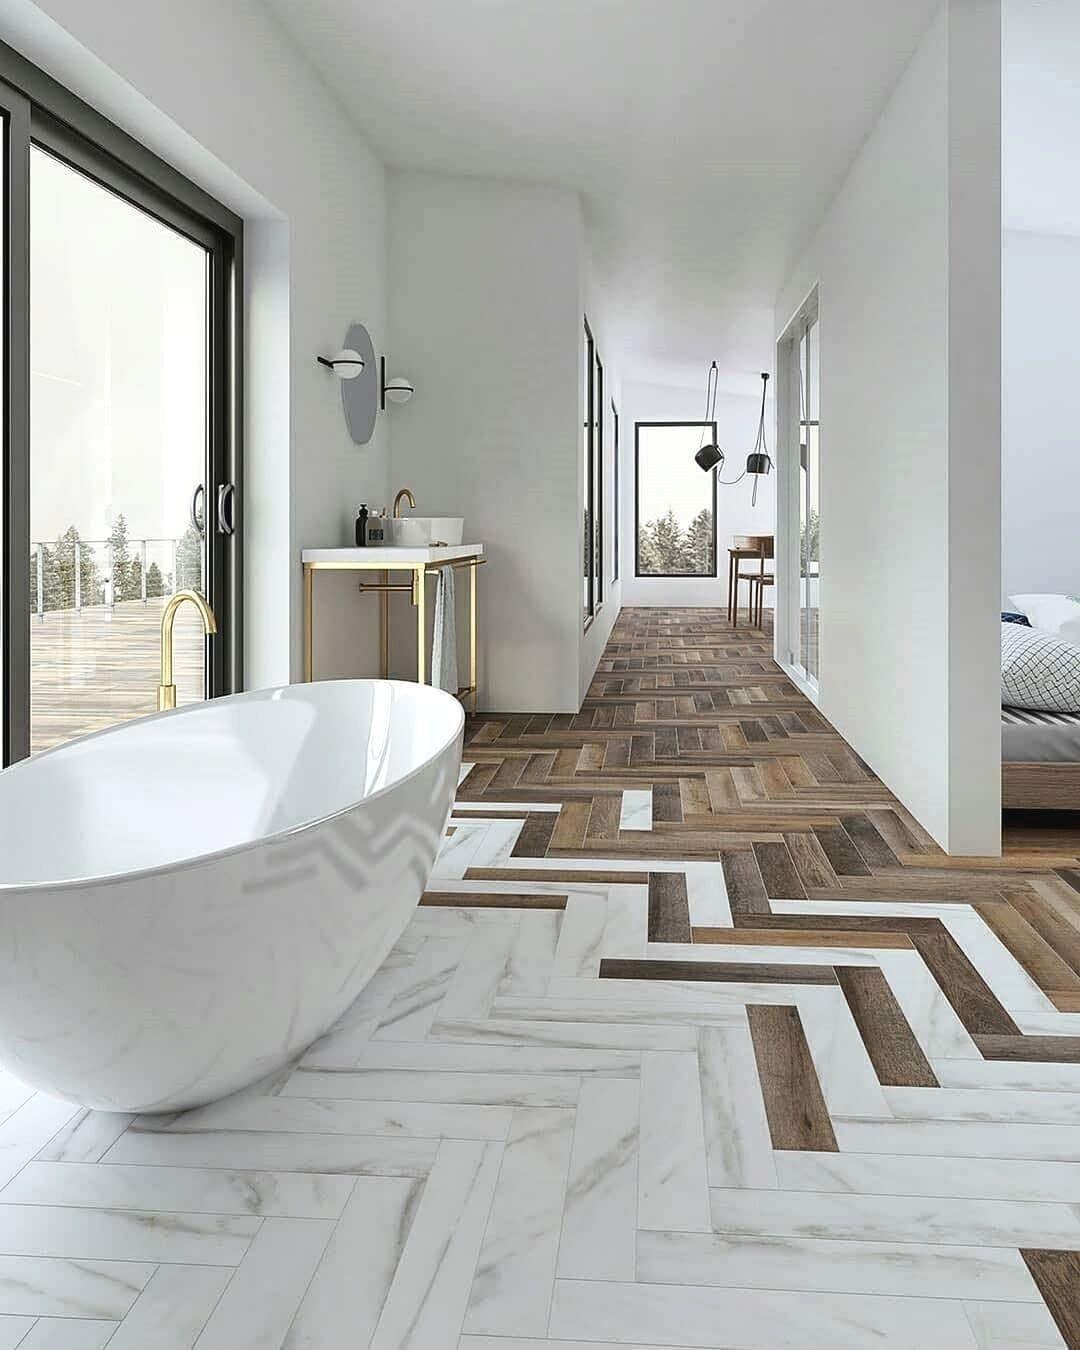 Co Myslicie O Takiej Aranzacji Bologna Italy Obserwuj Pelna Pomyslow Interi Modern White Bathroom Modern Bathroom Design Minimalism Interior